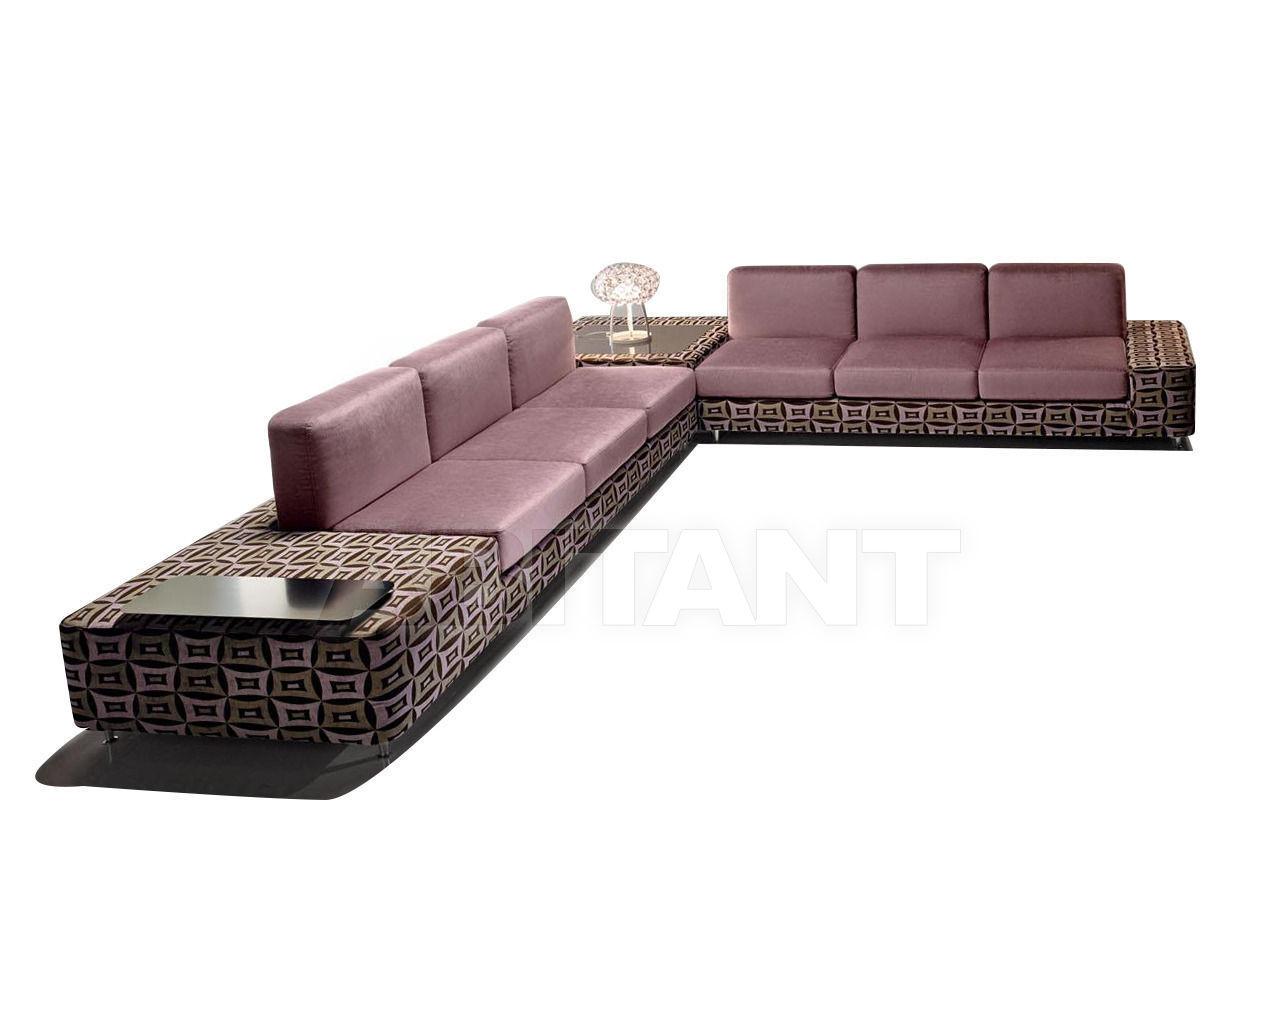 Купить Диван Adrenalina S-bench S-oft Sofa